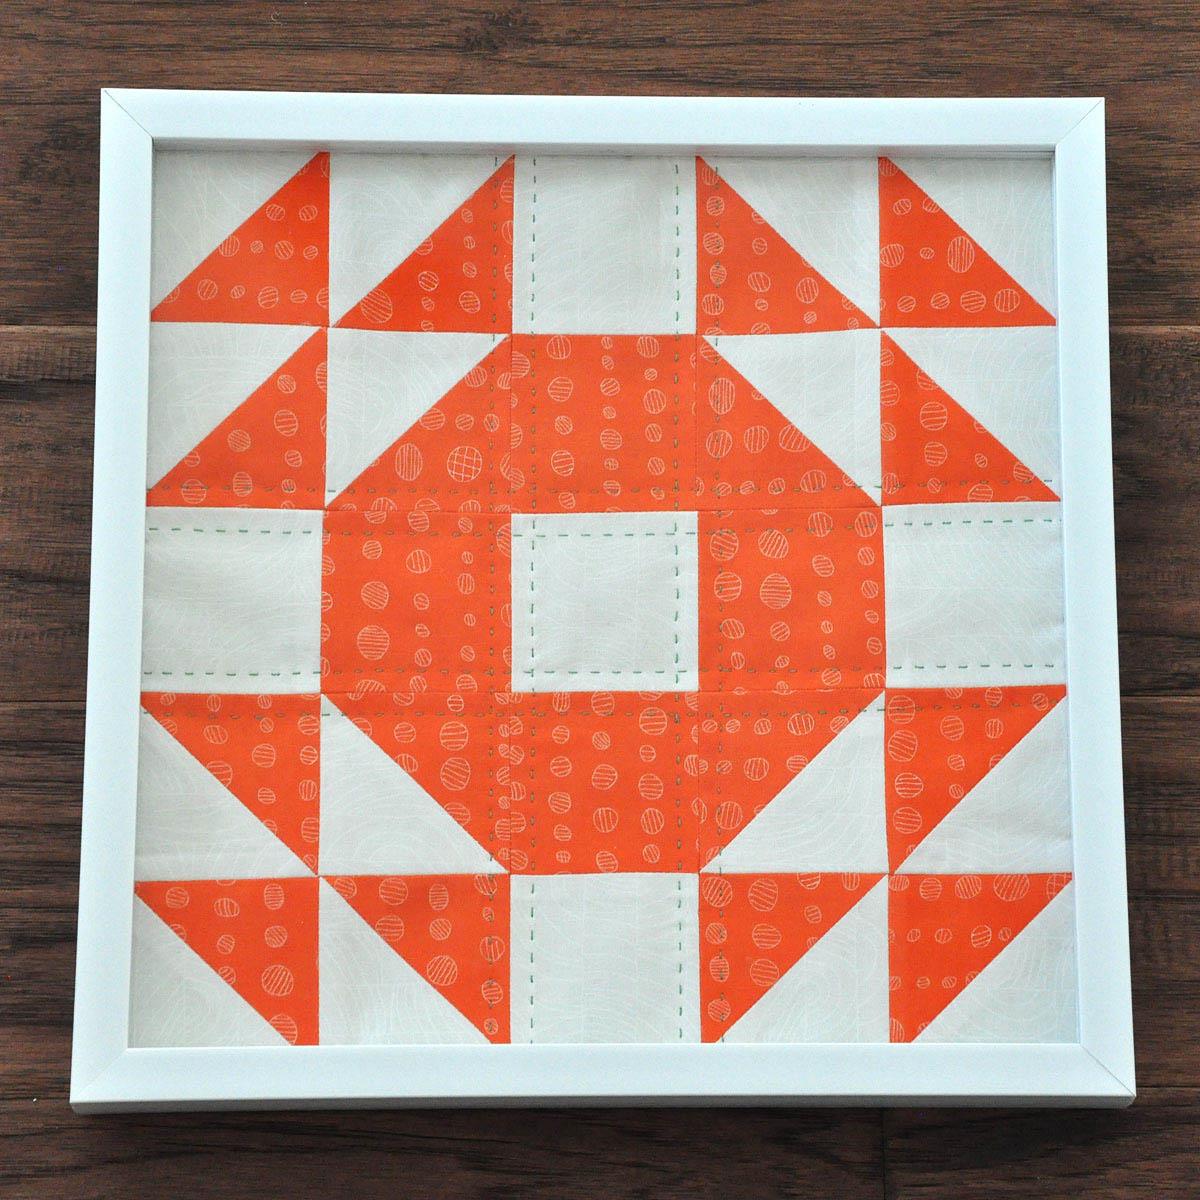 Single Wedding Ring Quilt Block - telafante : single wedding ring quilt - Adamdwight.com